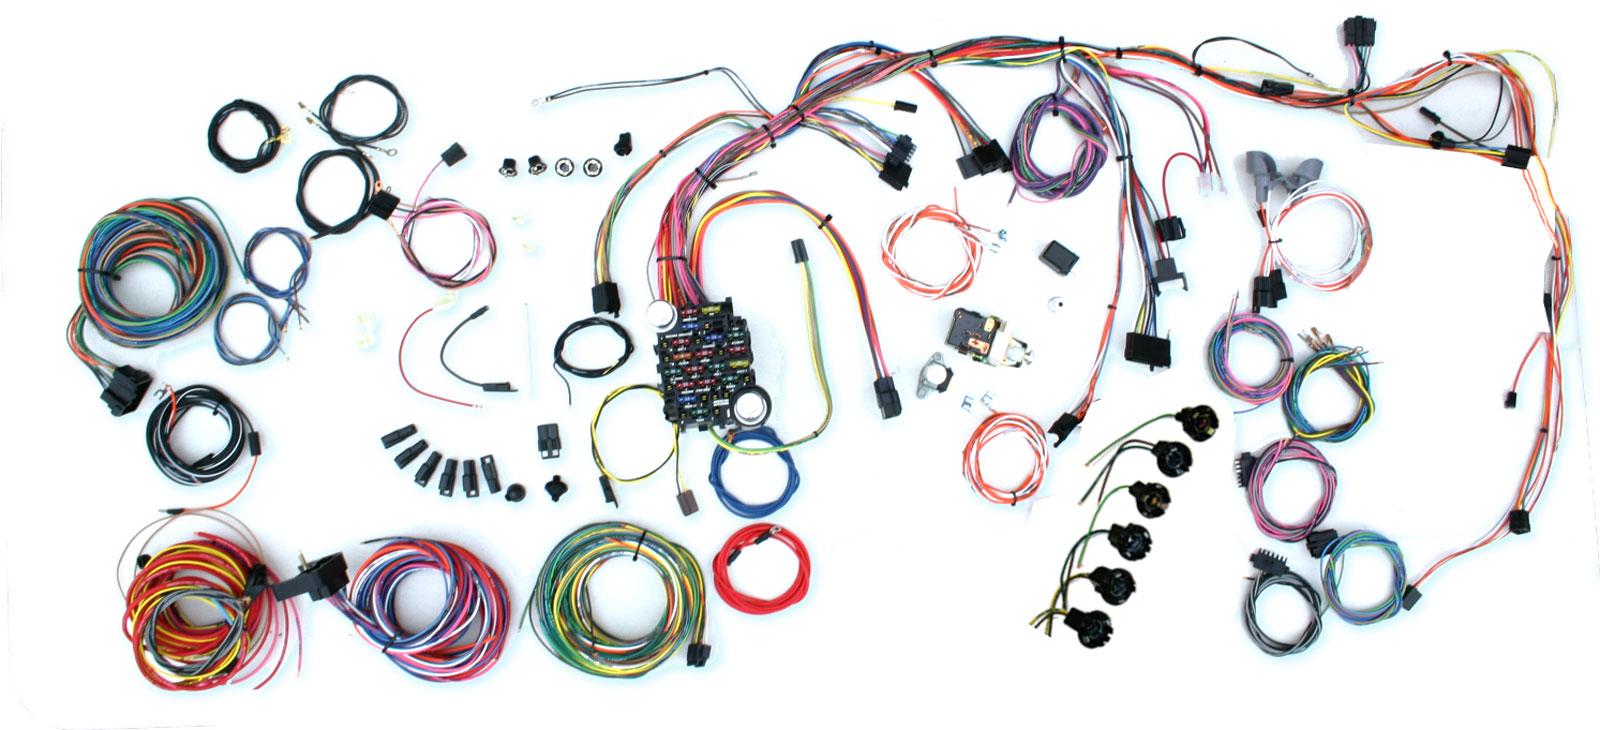 Wiring Harness Kits 1974 Dodge Challenger